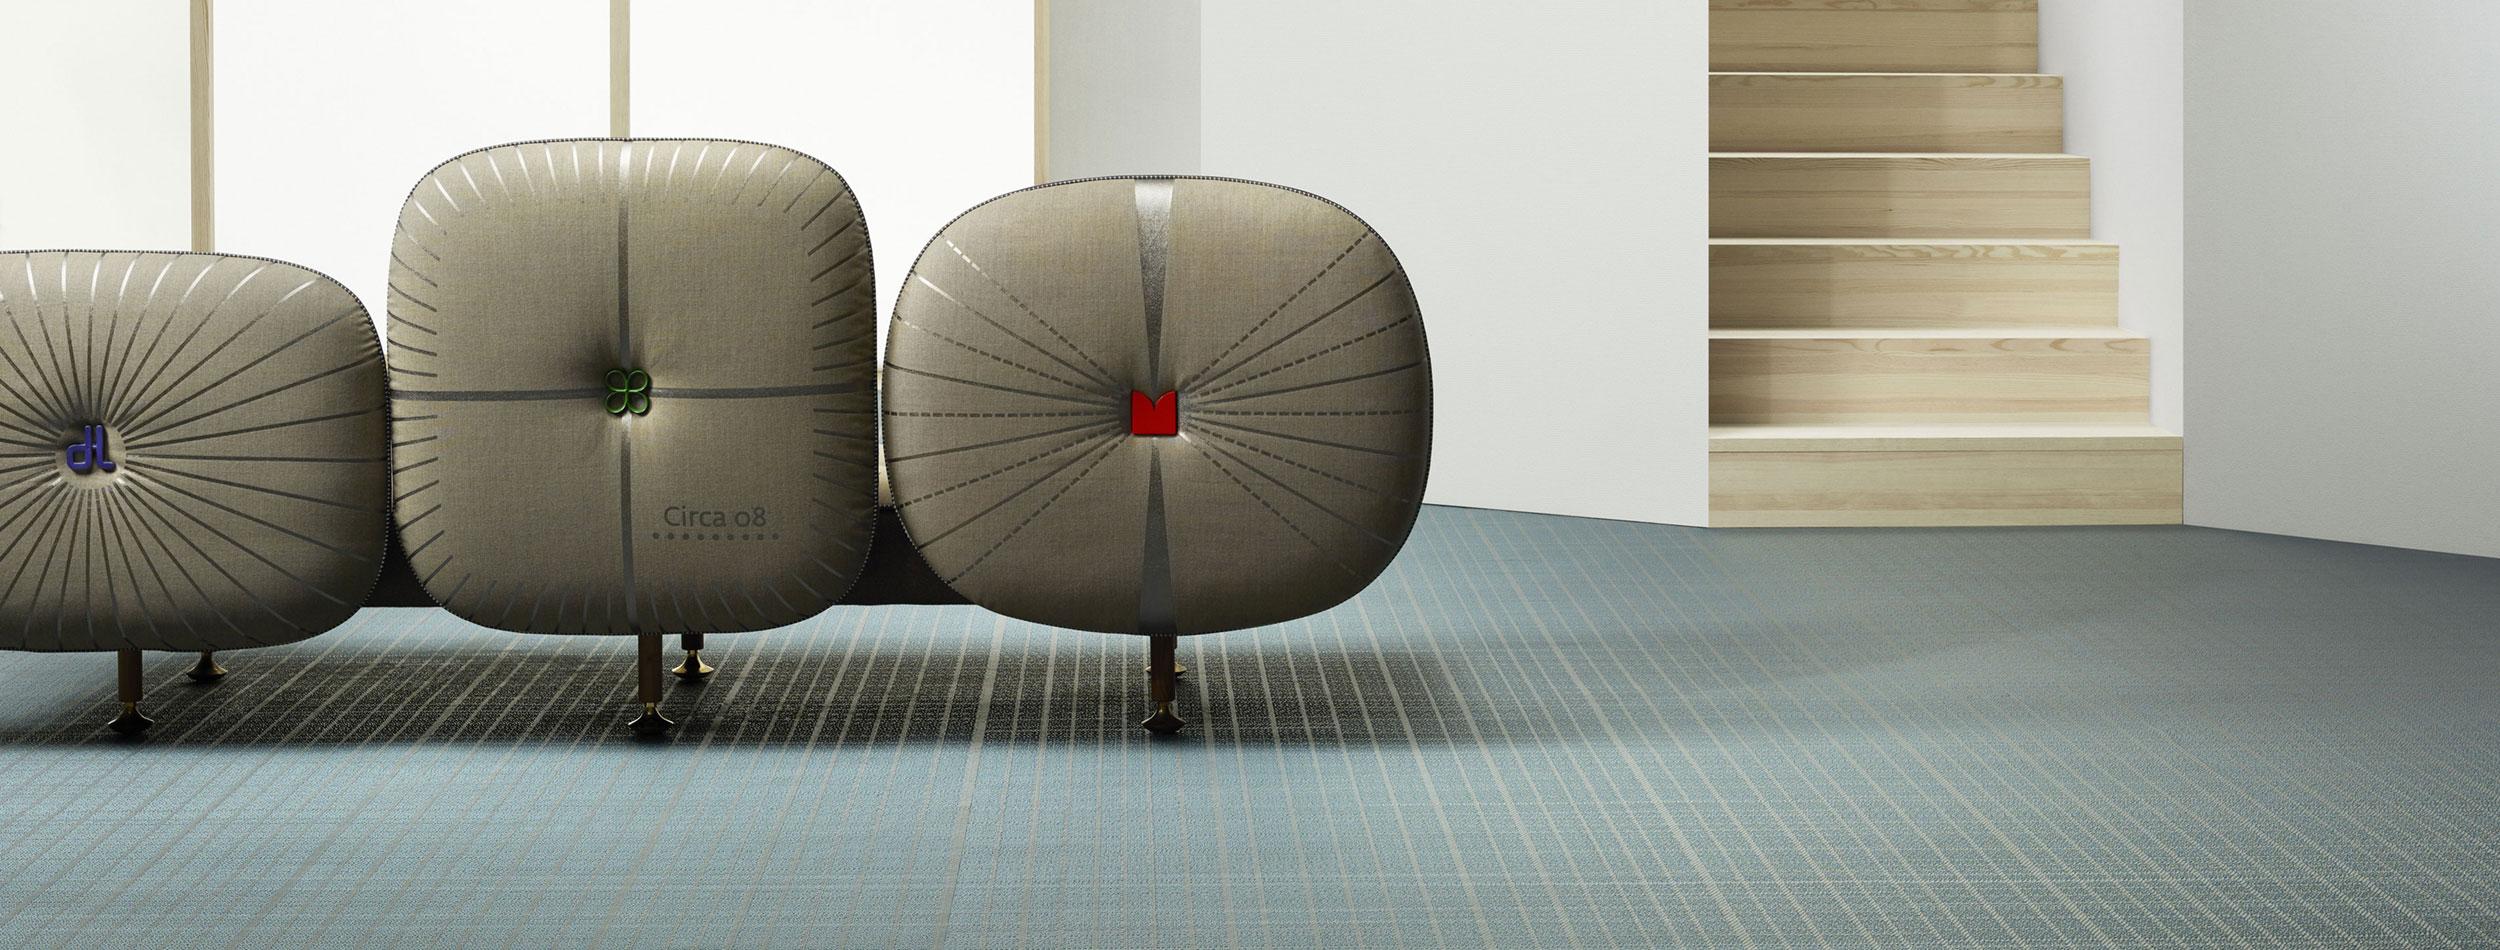 Bolon flooring sussex south east england fabulous floors for Fabulous flooring